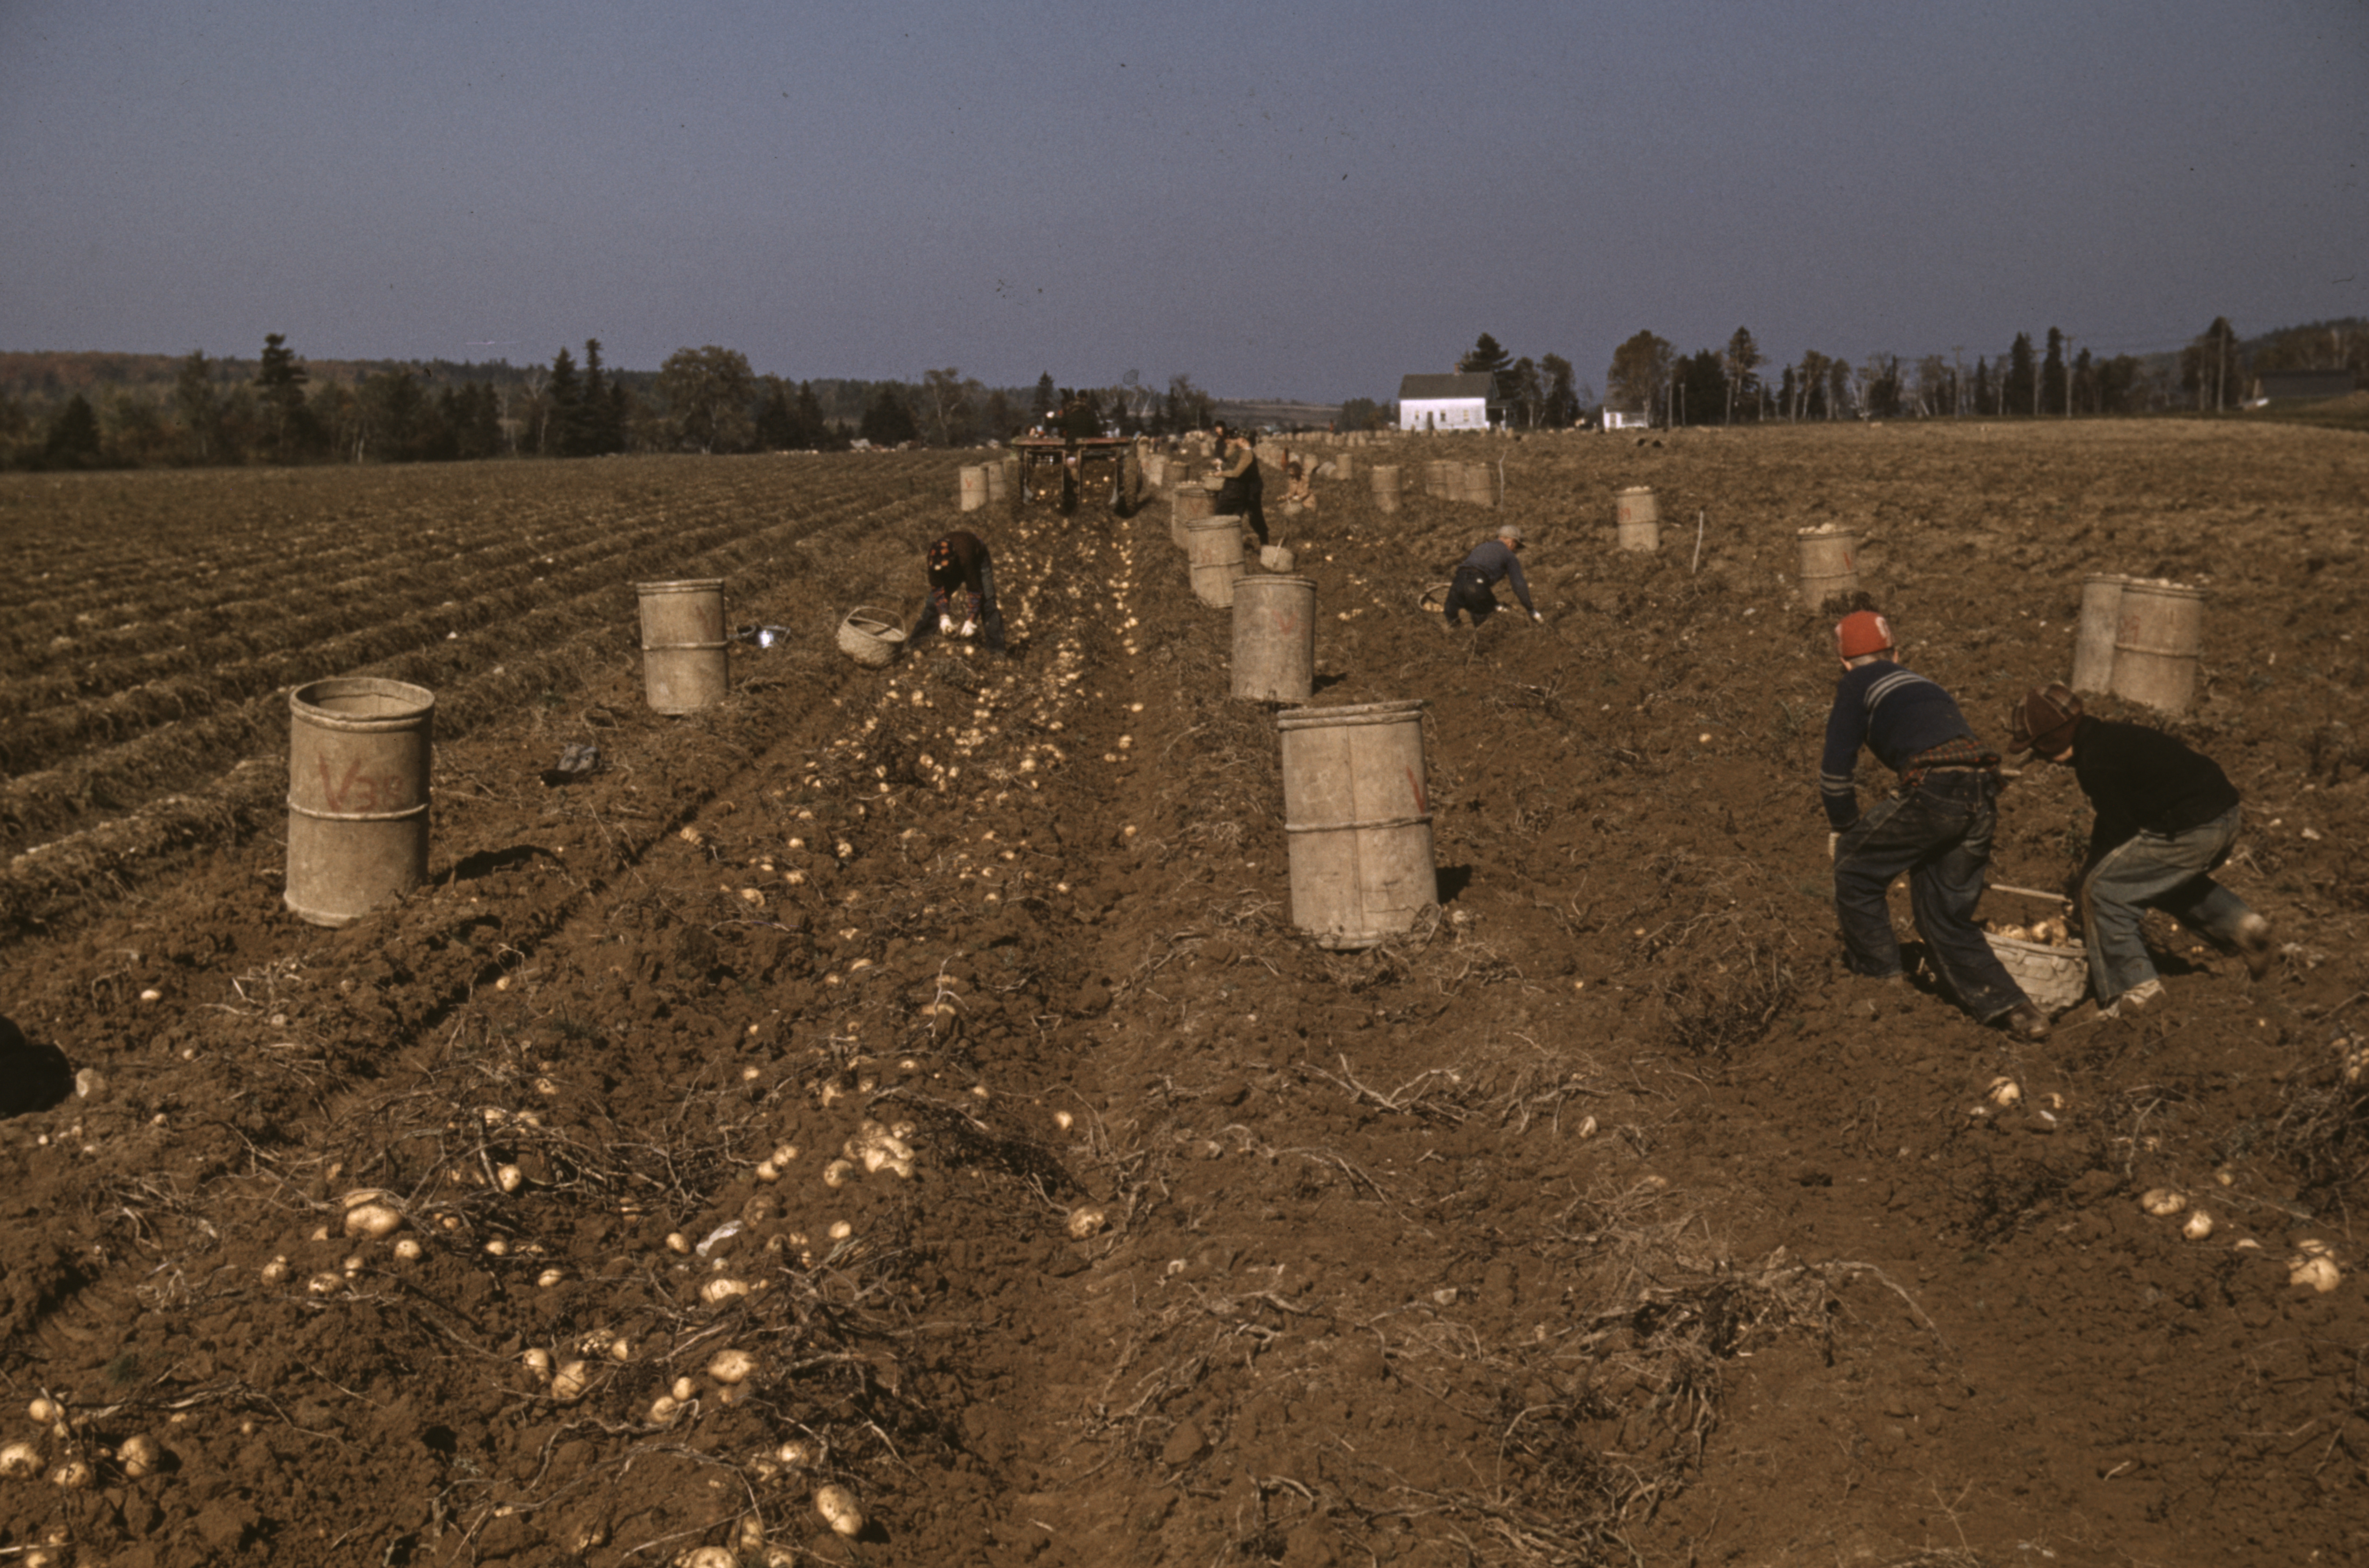 Child laborers in a potatoe field (Maine) 1940